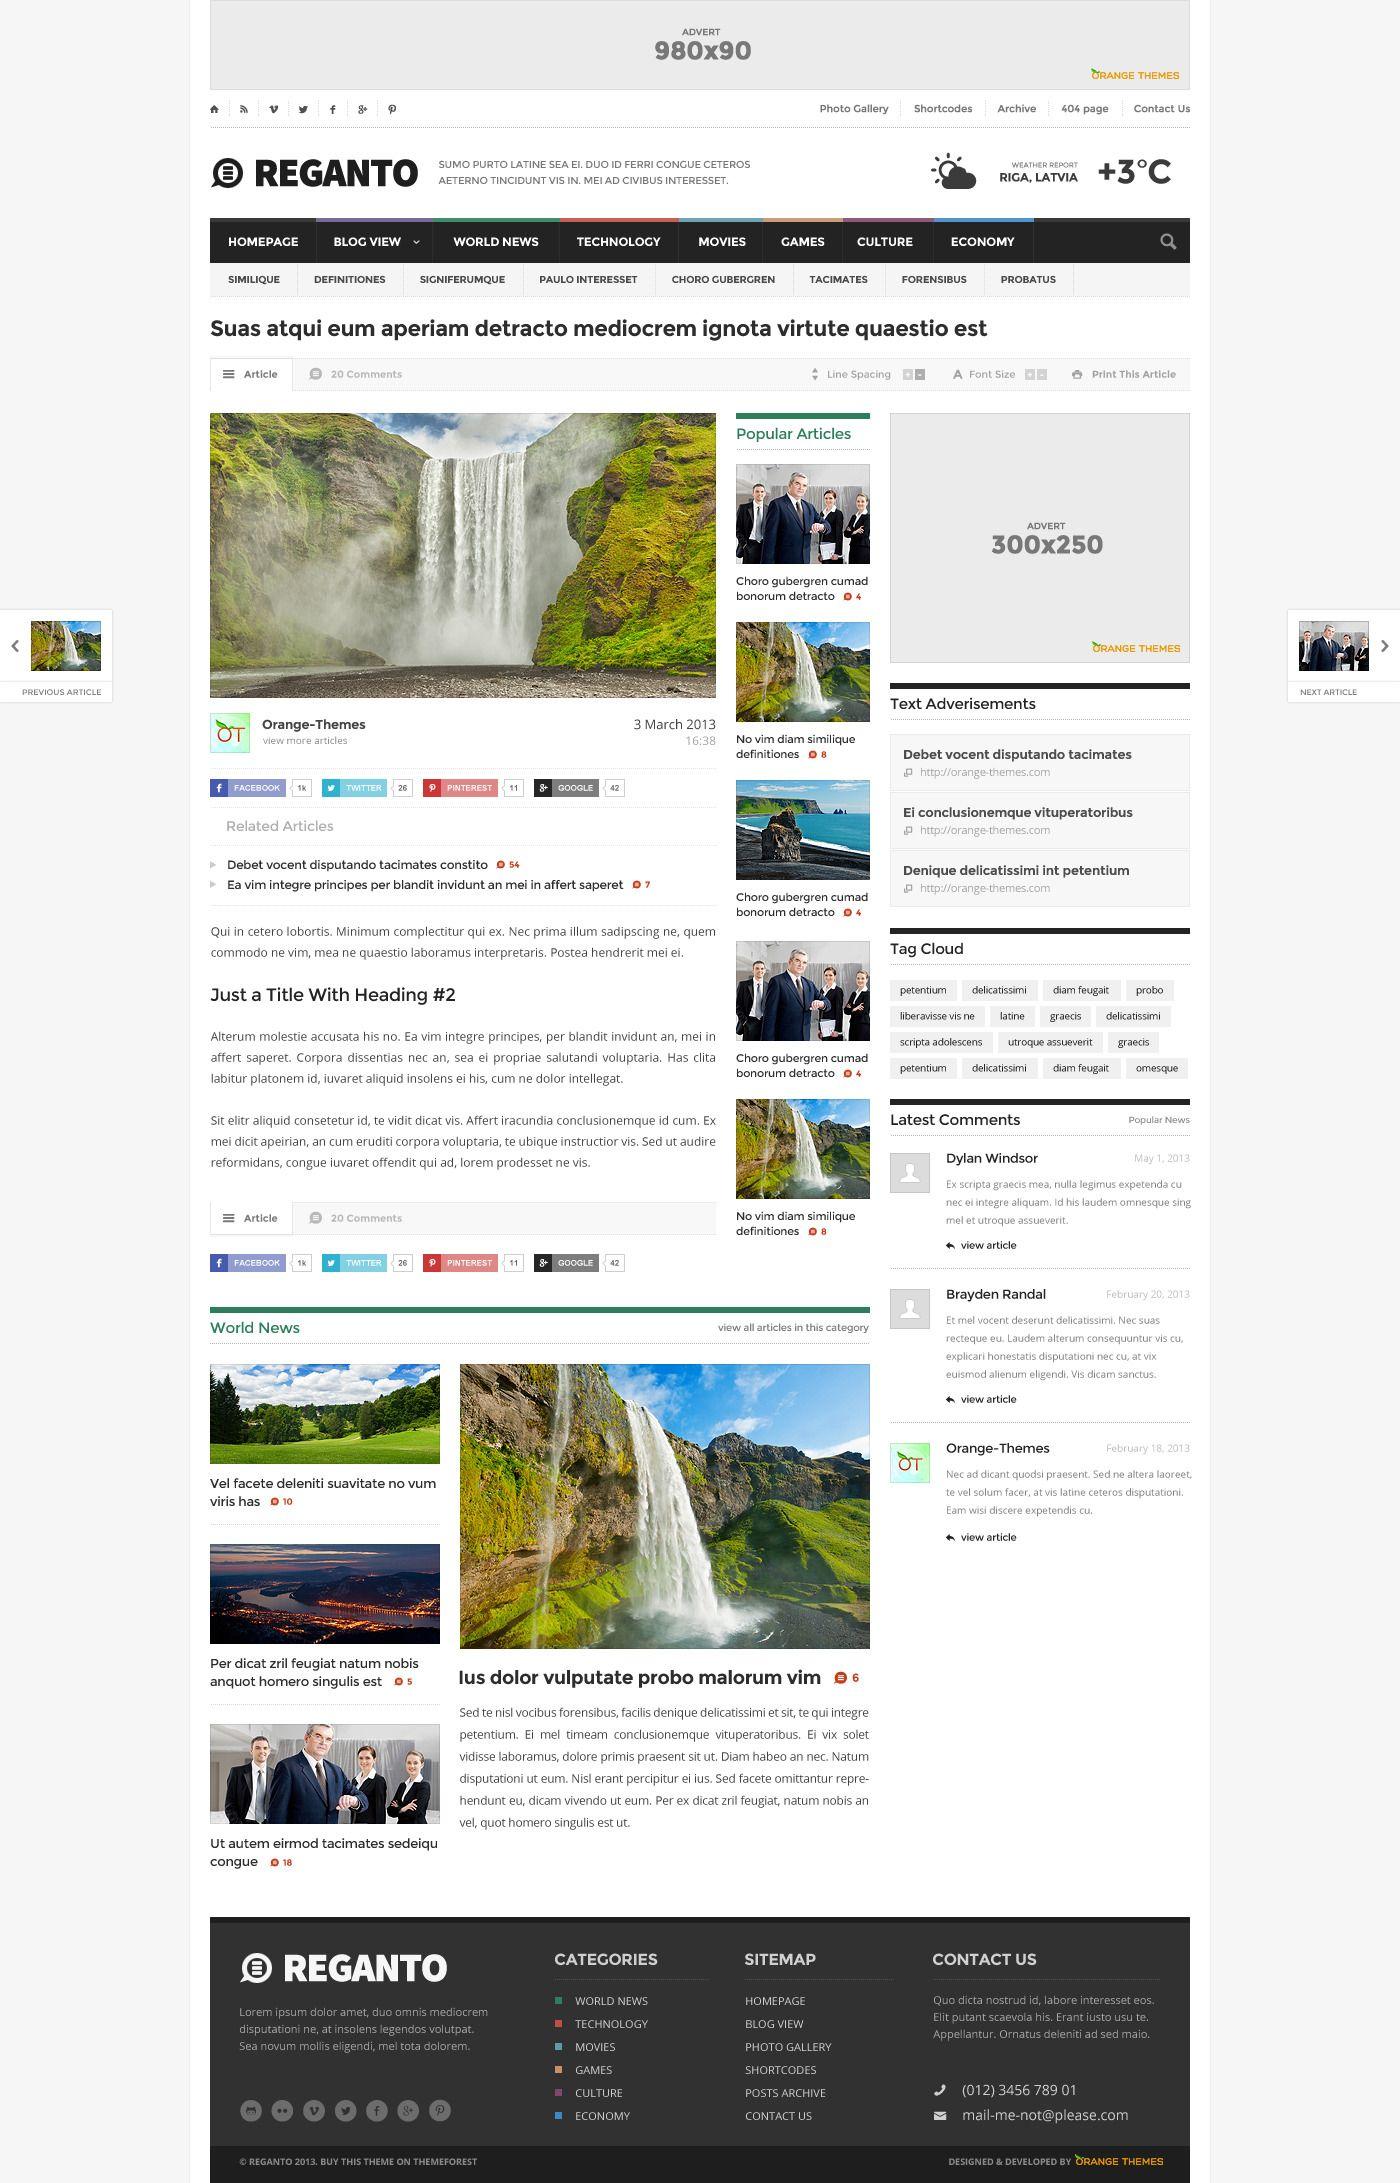 Reganto - Massive Magazine Theme | Wordpress, Template and Magazines